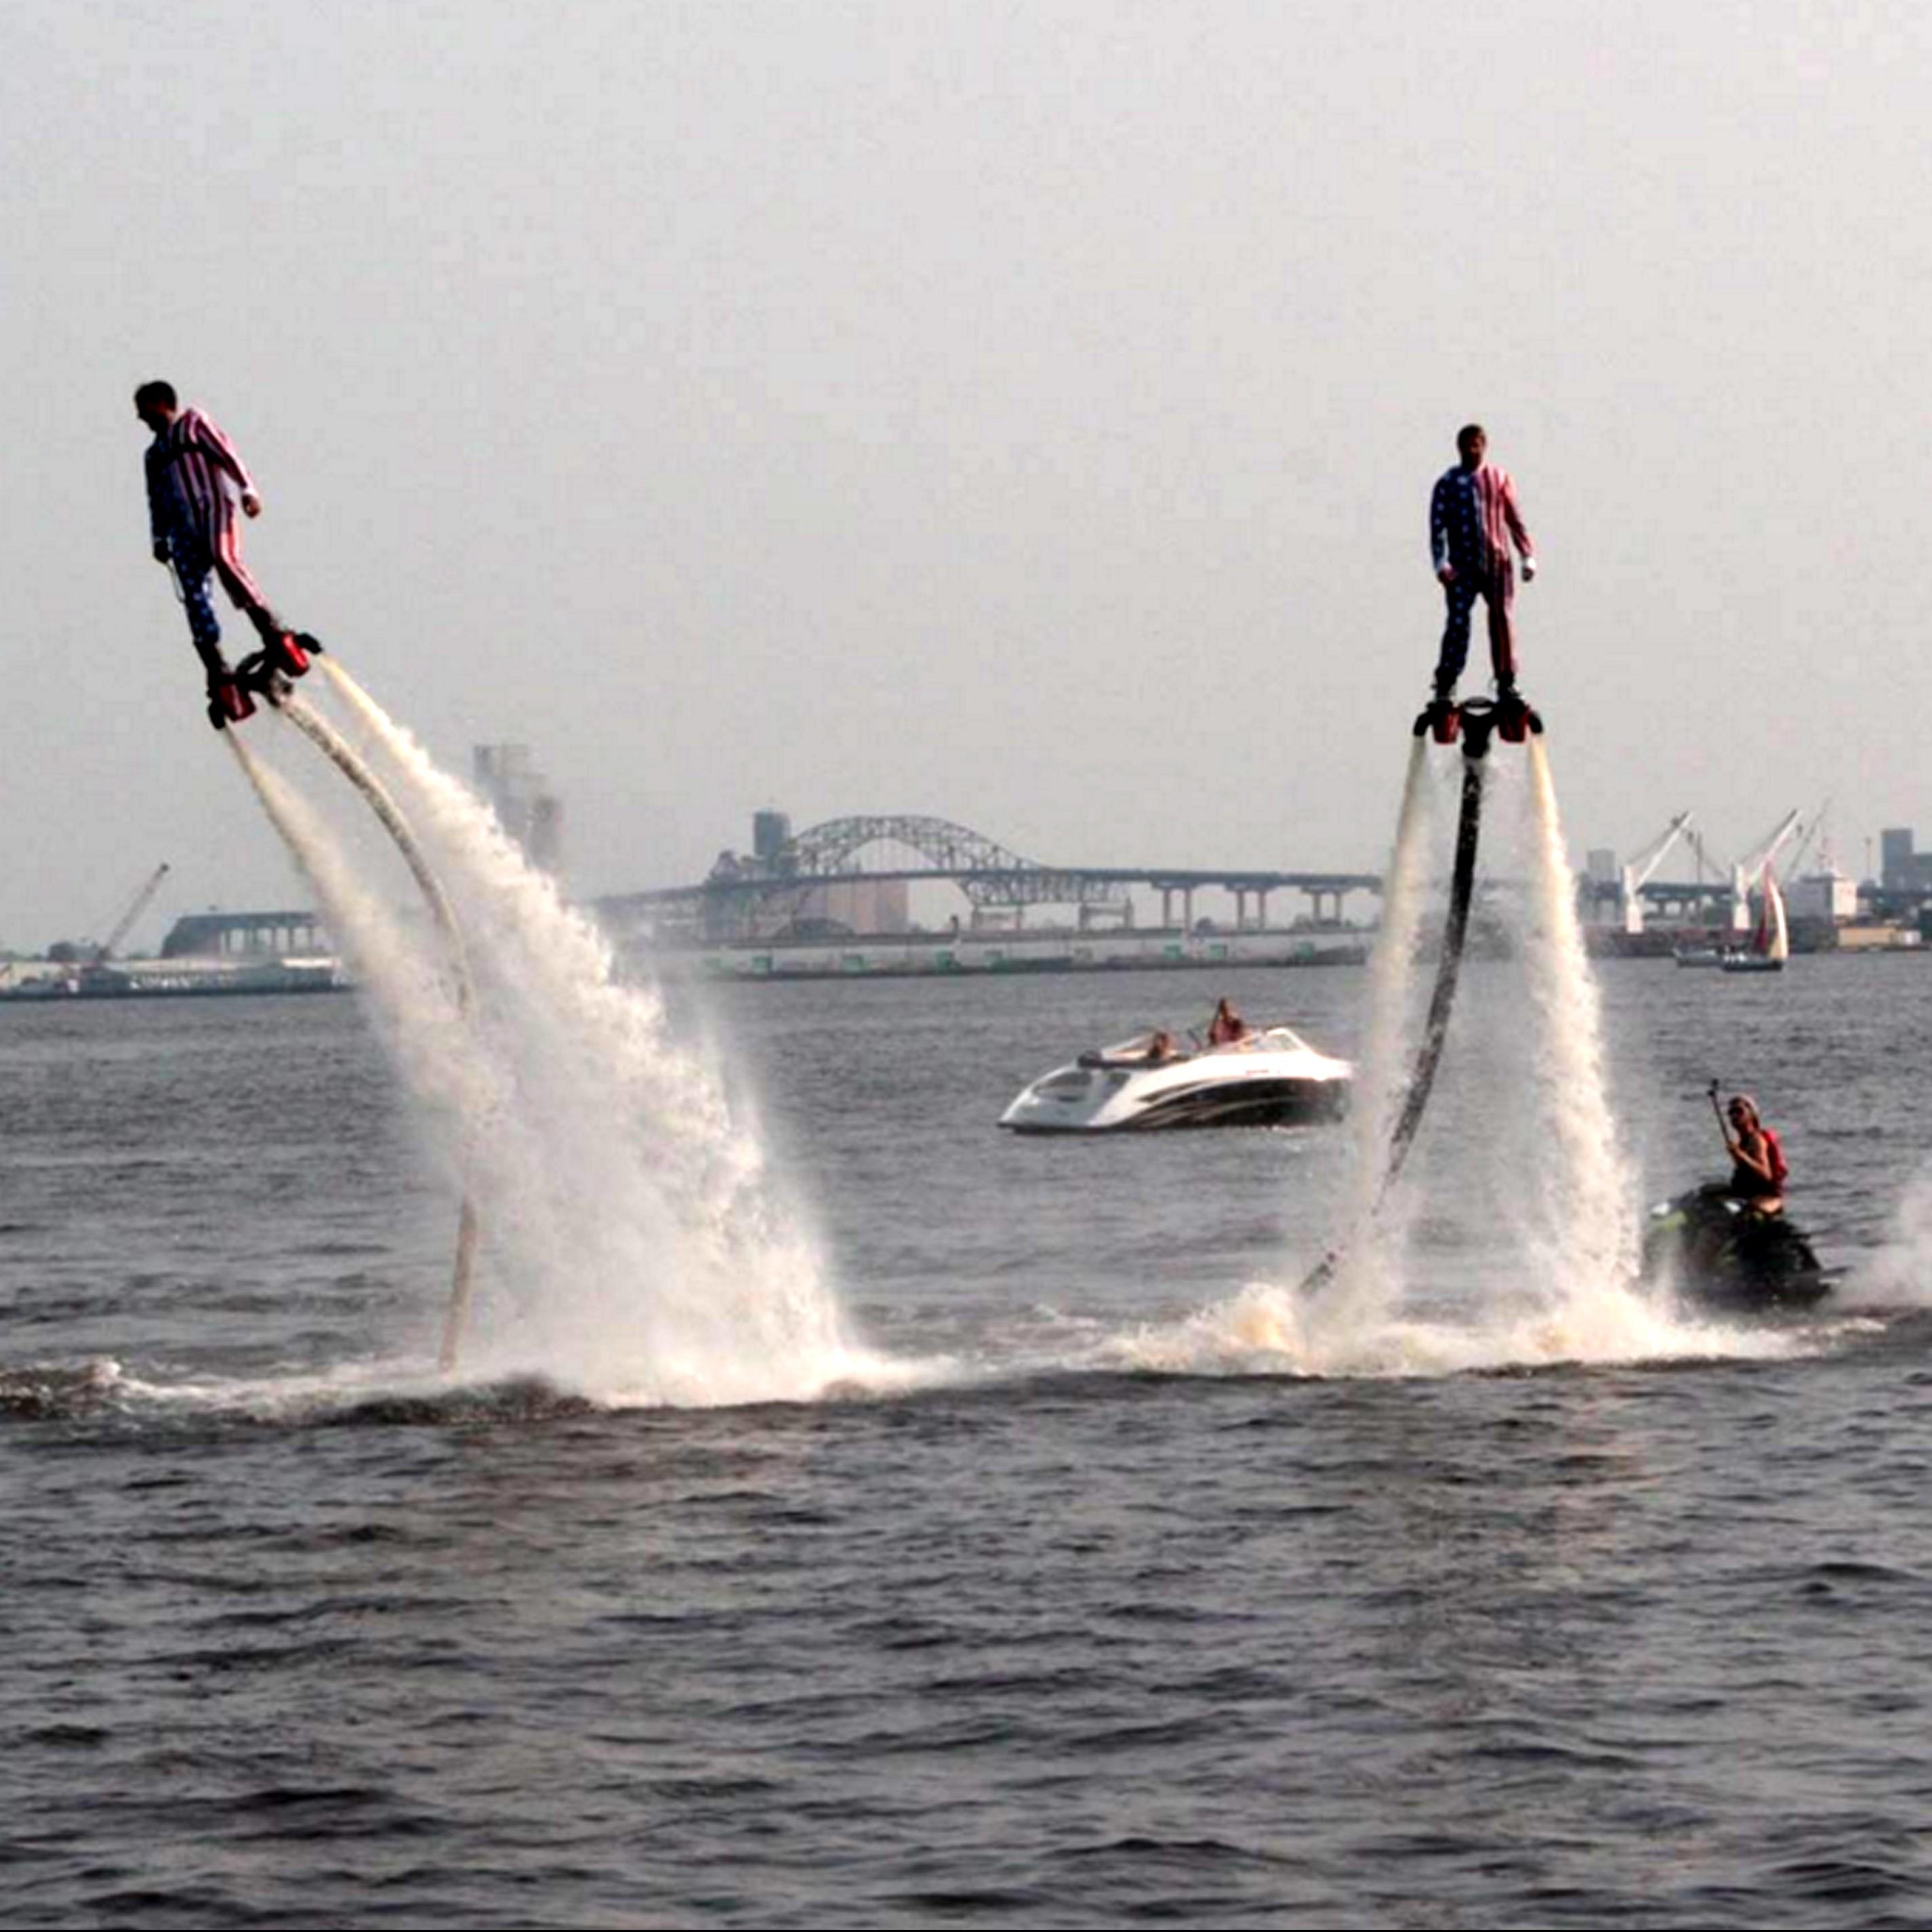 Lake Superior Fly-Board Rentals